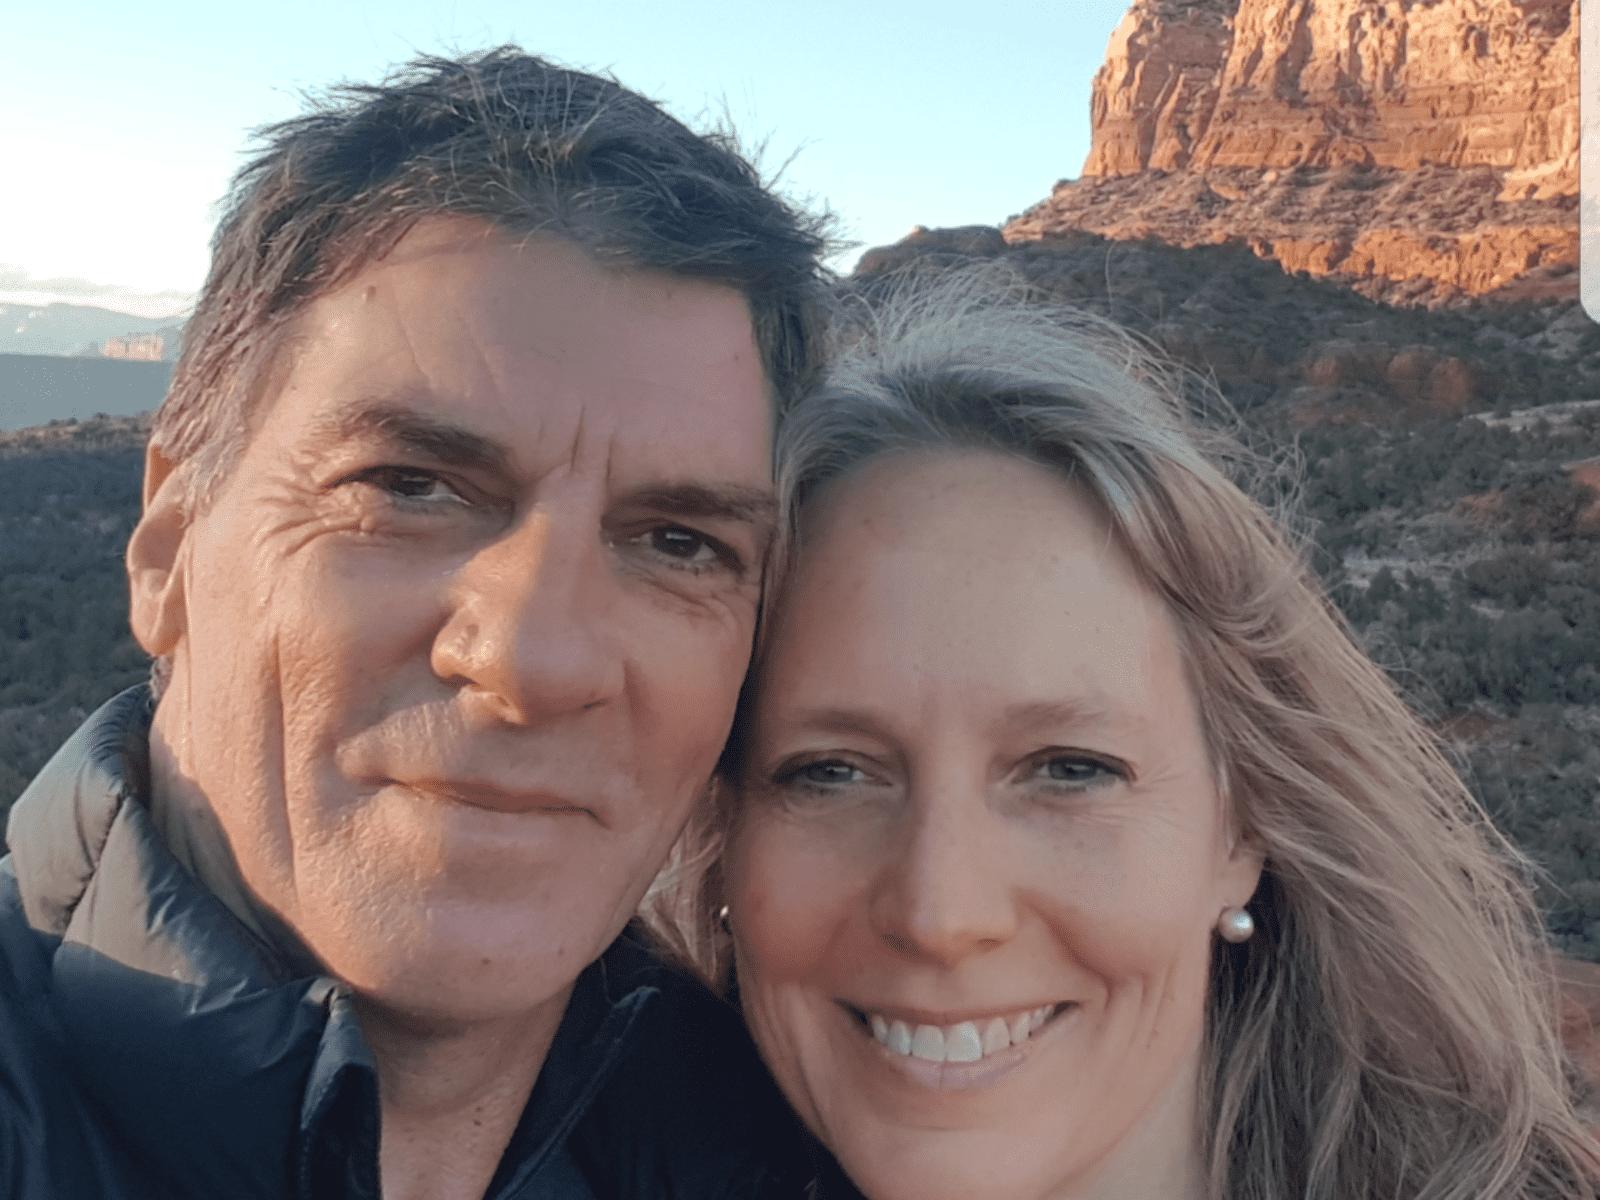 Neil & Sharon from Perth, Western Australia, Australia